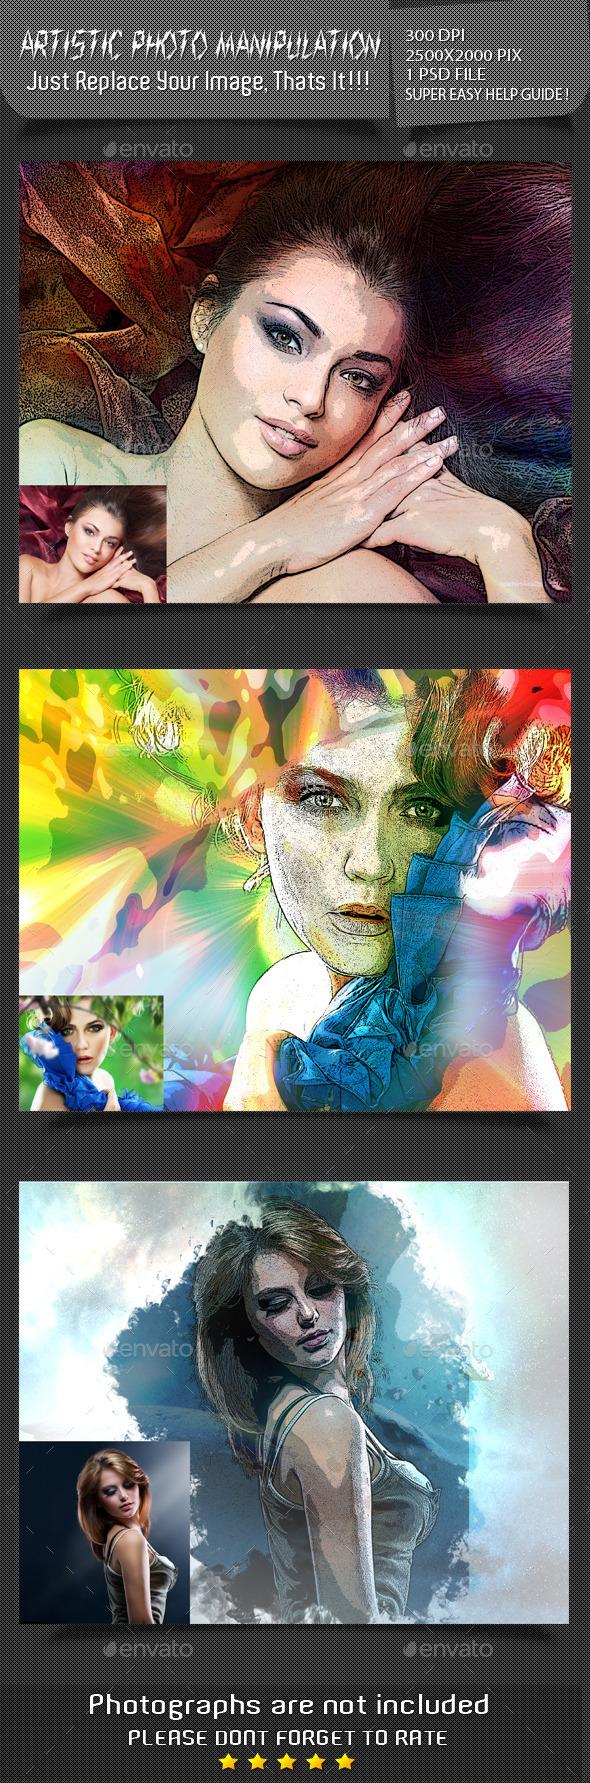 Artistic Photo Manipulation - Artistic Photo Templates